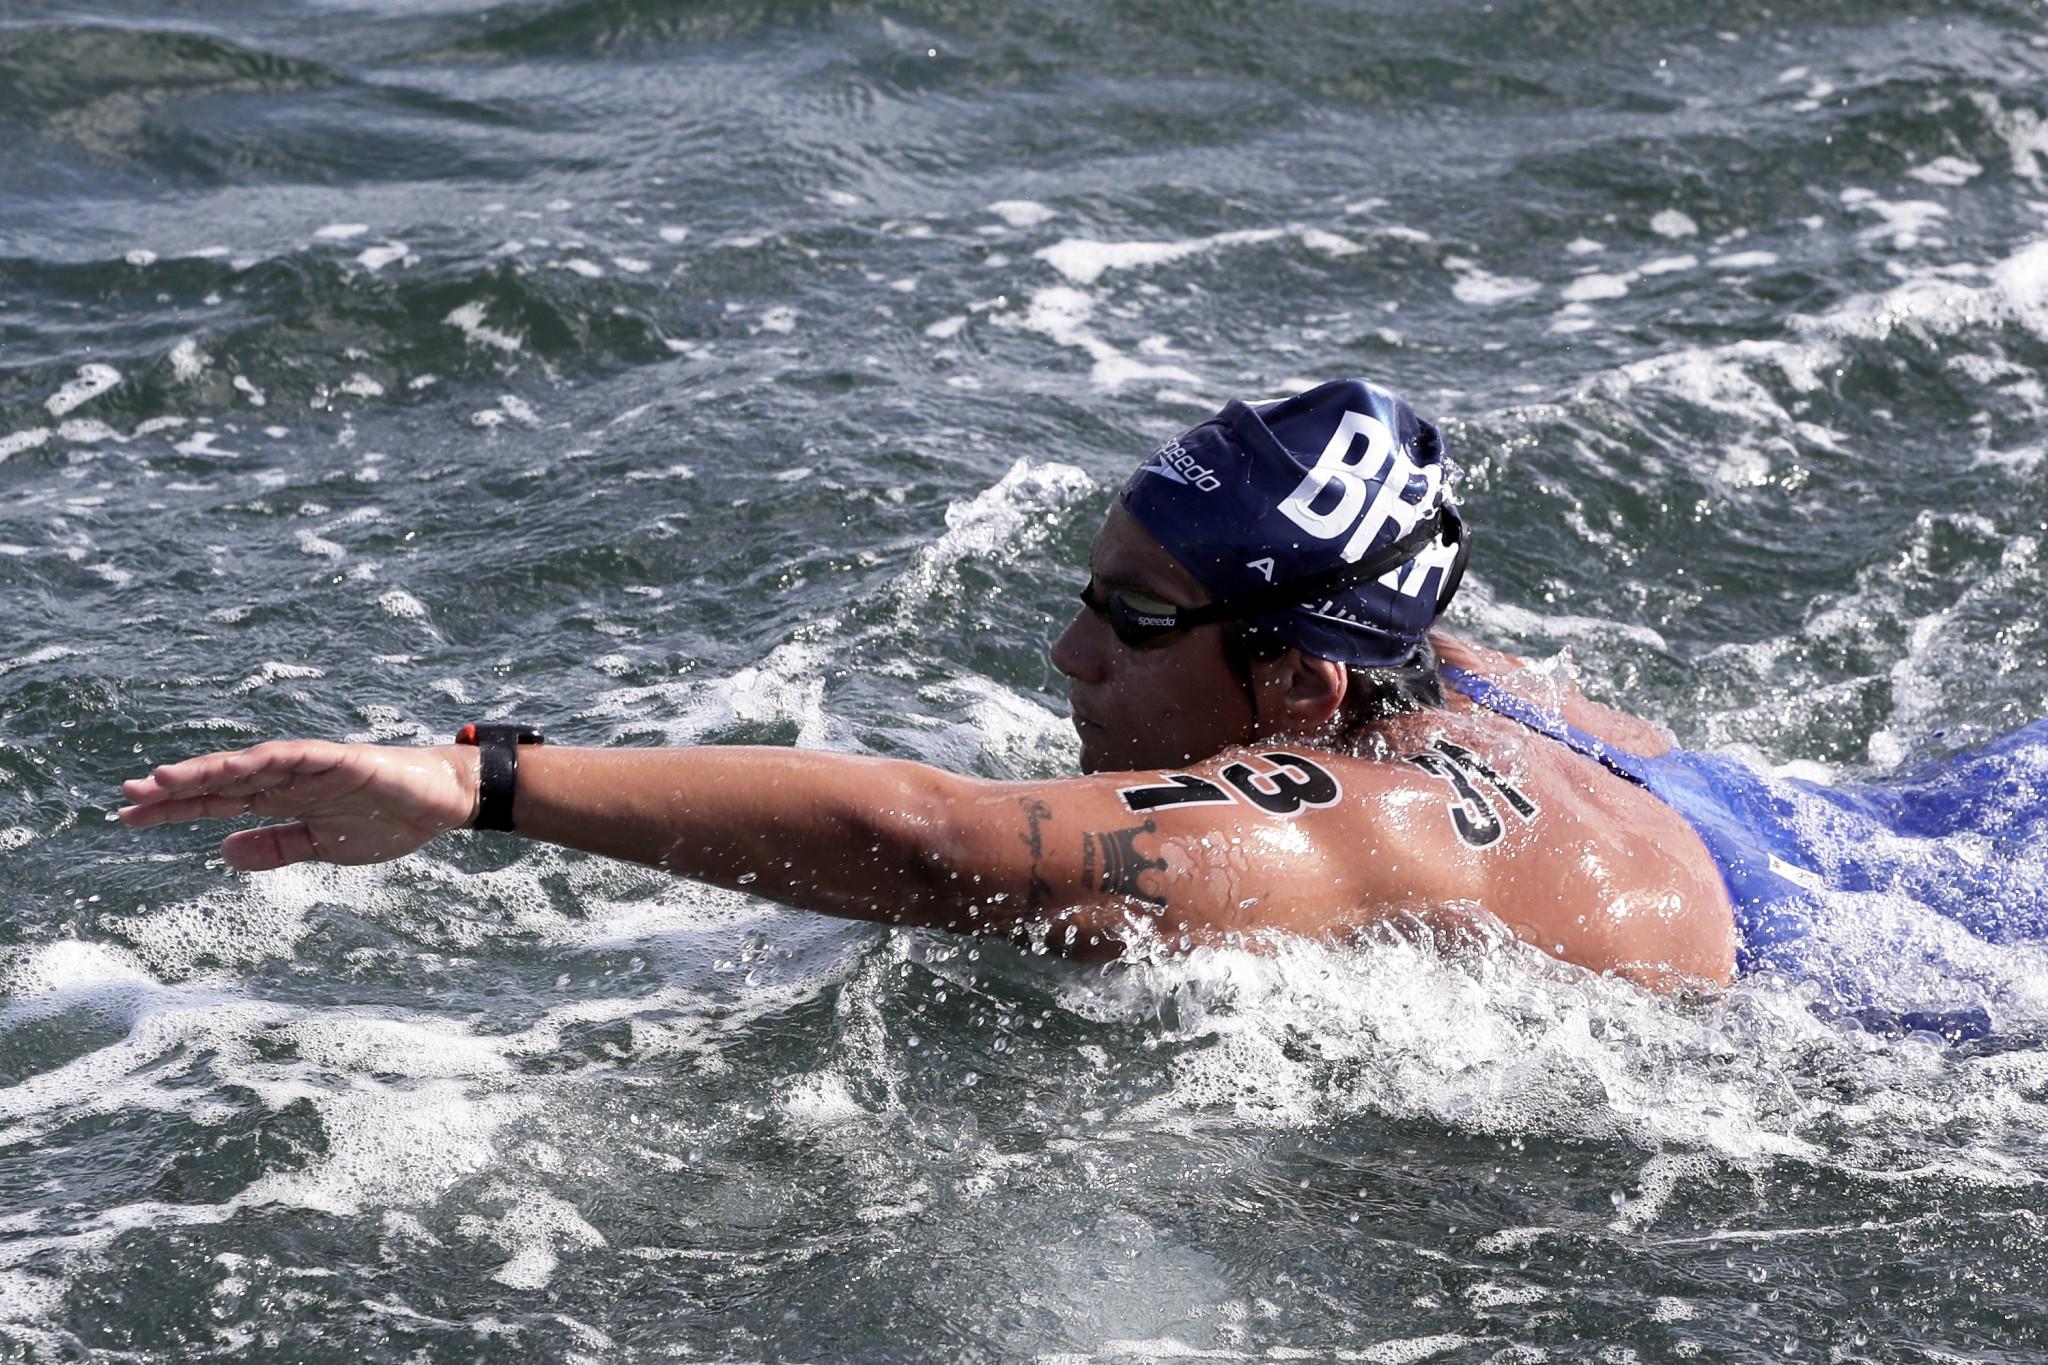 Cunha pips Cassignol at season-opening Marathon Swim World Series race